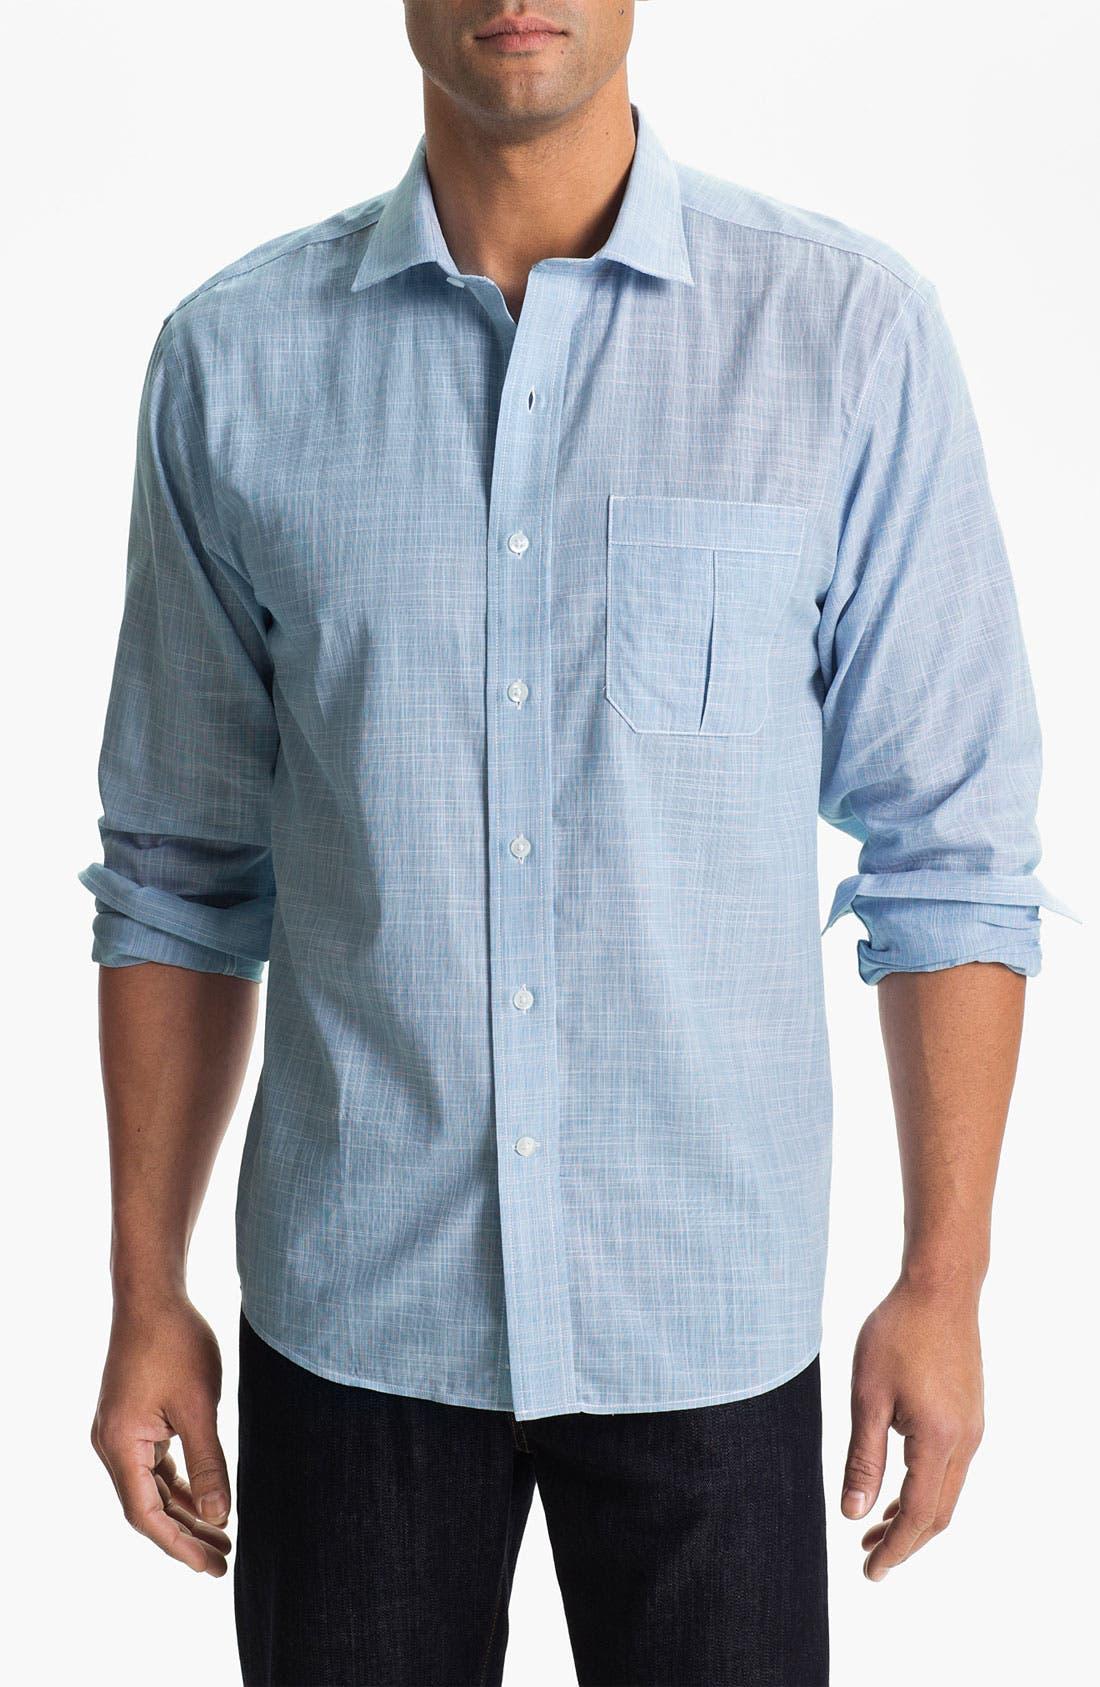 Alternate Image 1 Selected - Cutter & Buck 'Blue Ridge Solid' Regular Fit Sport Shirt (Online Only)